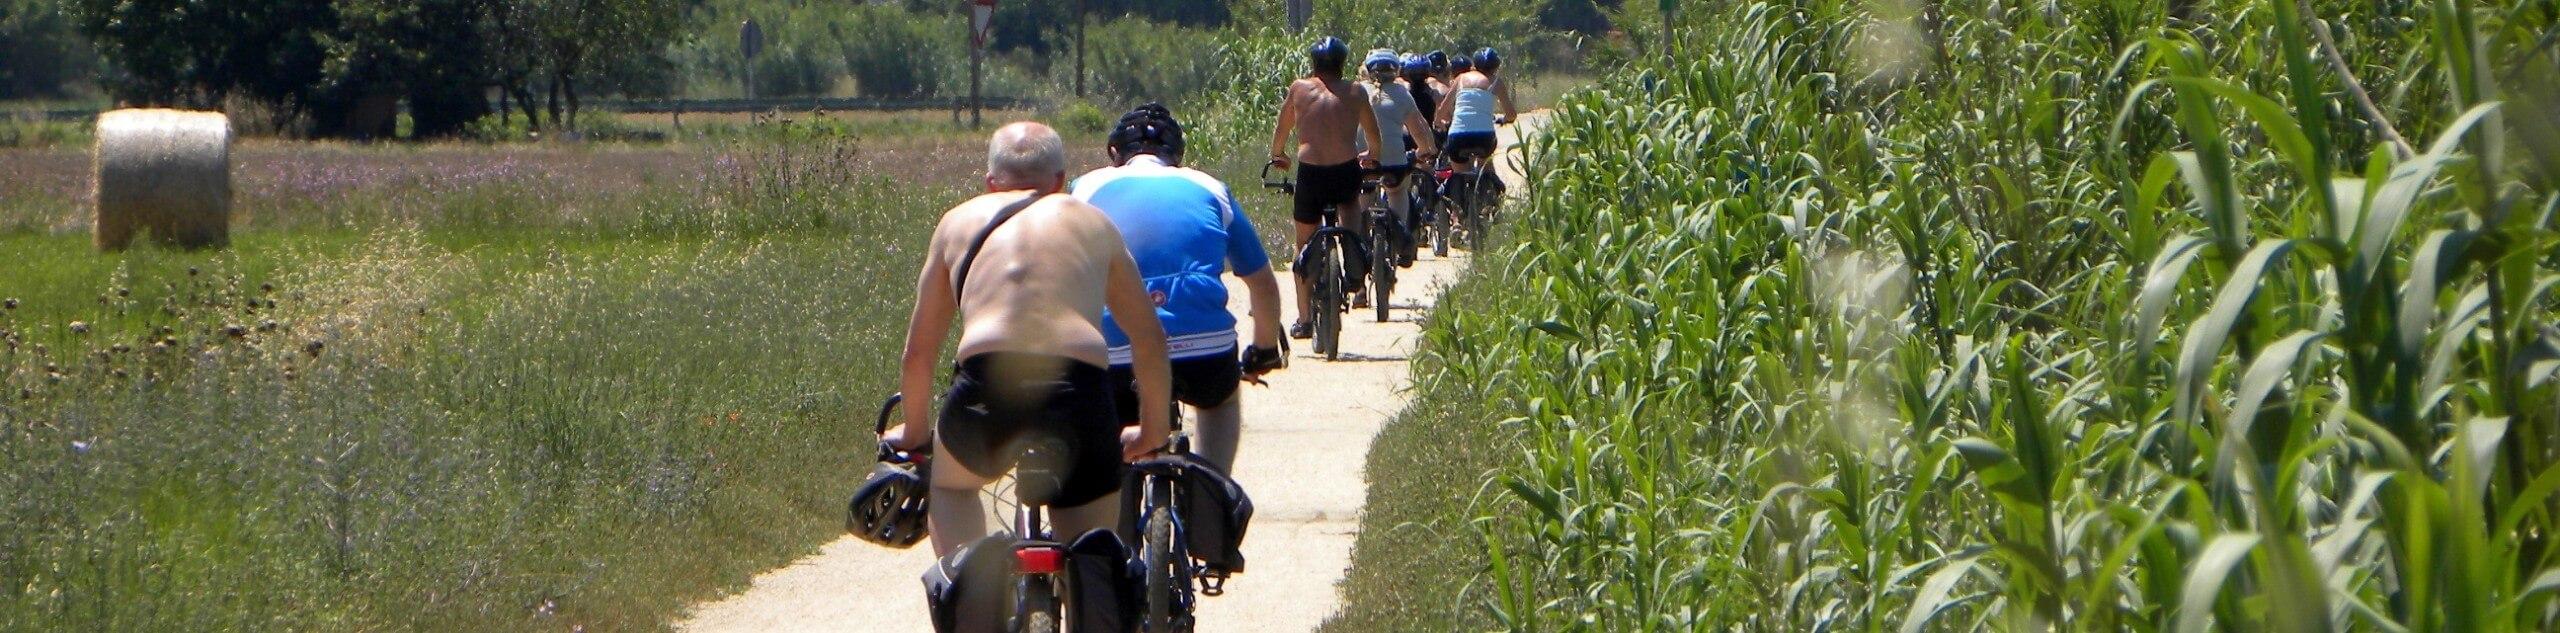 Cycling Tour of the Catalonia Coast